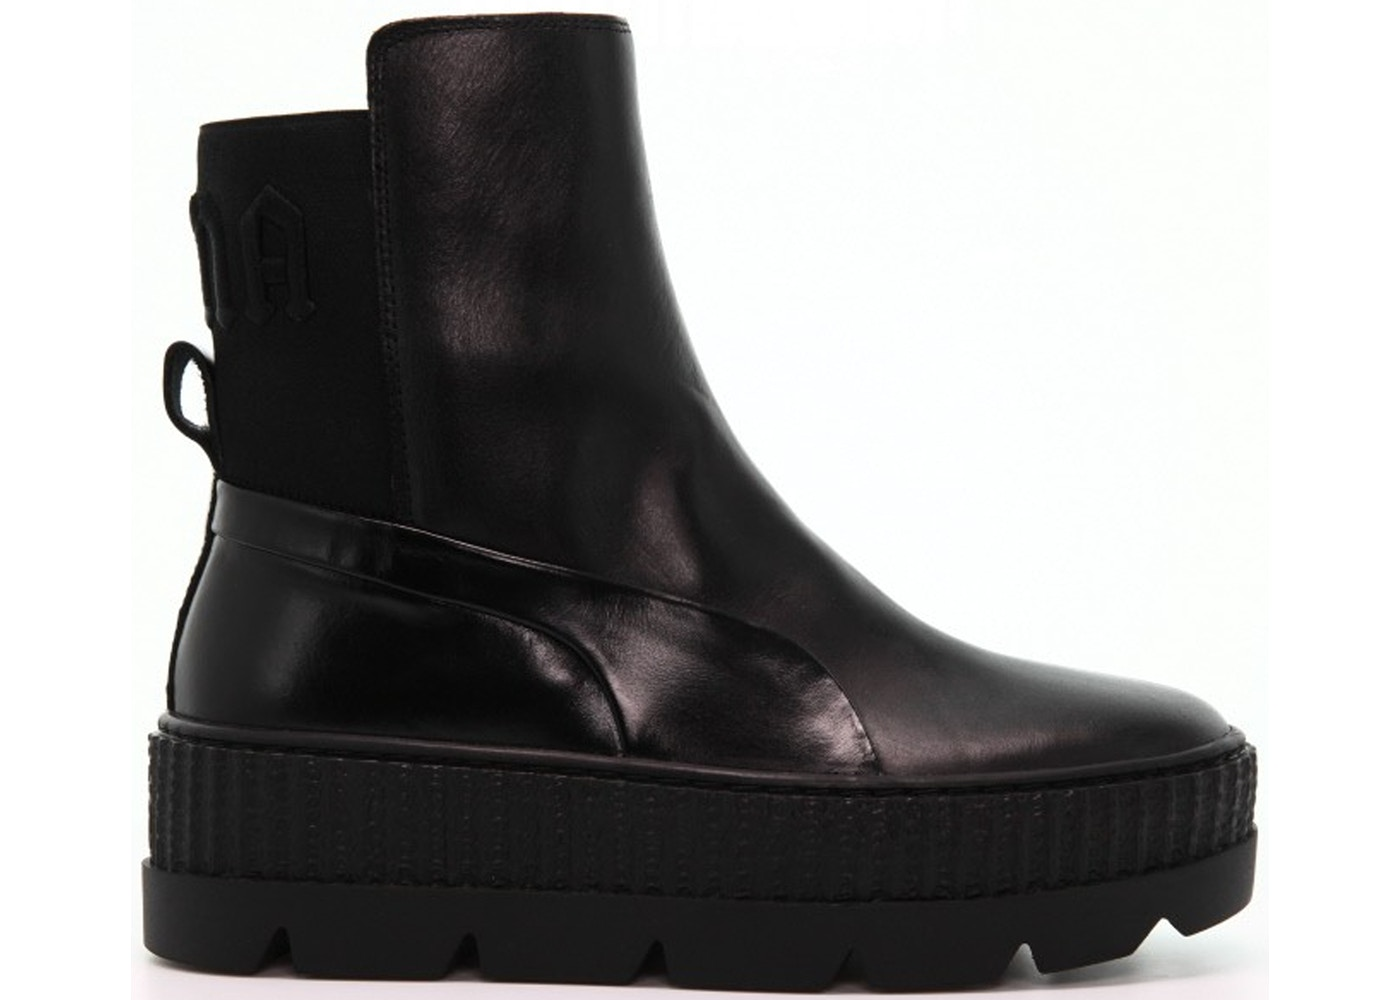 finest selection 9a2c2 9ccd1 Puma Chelsea Sneaker Boot Rihanna Fenty Black (W)